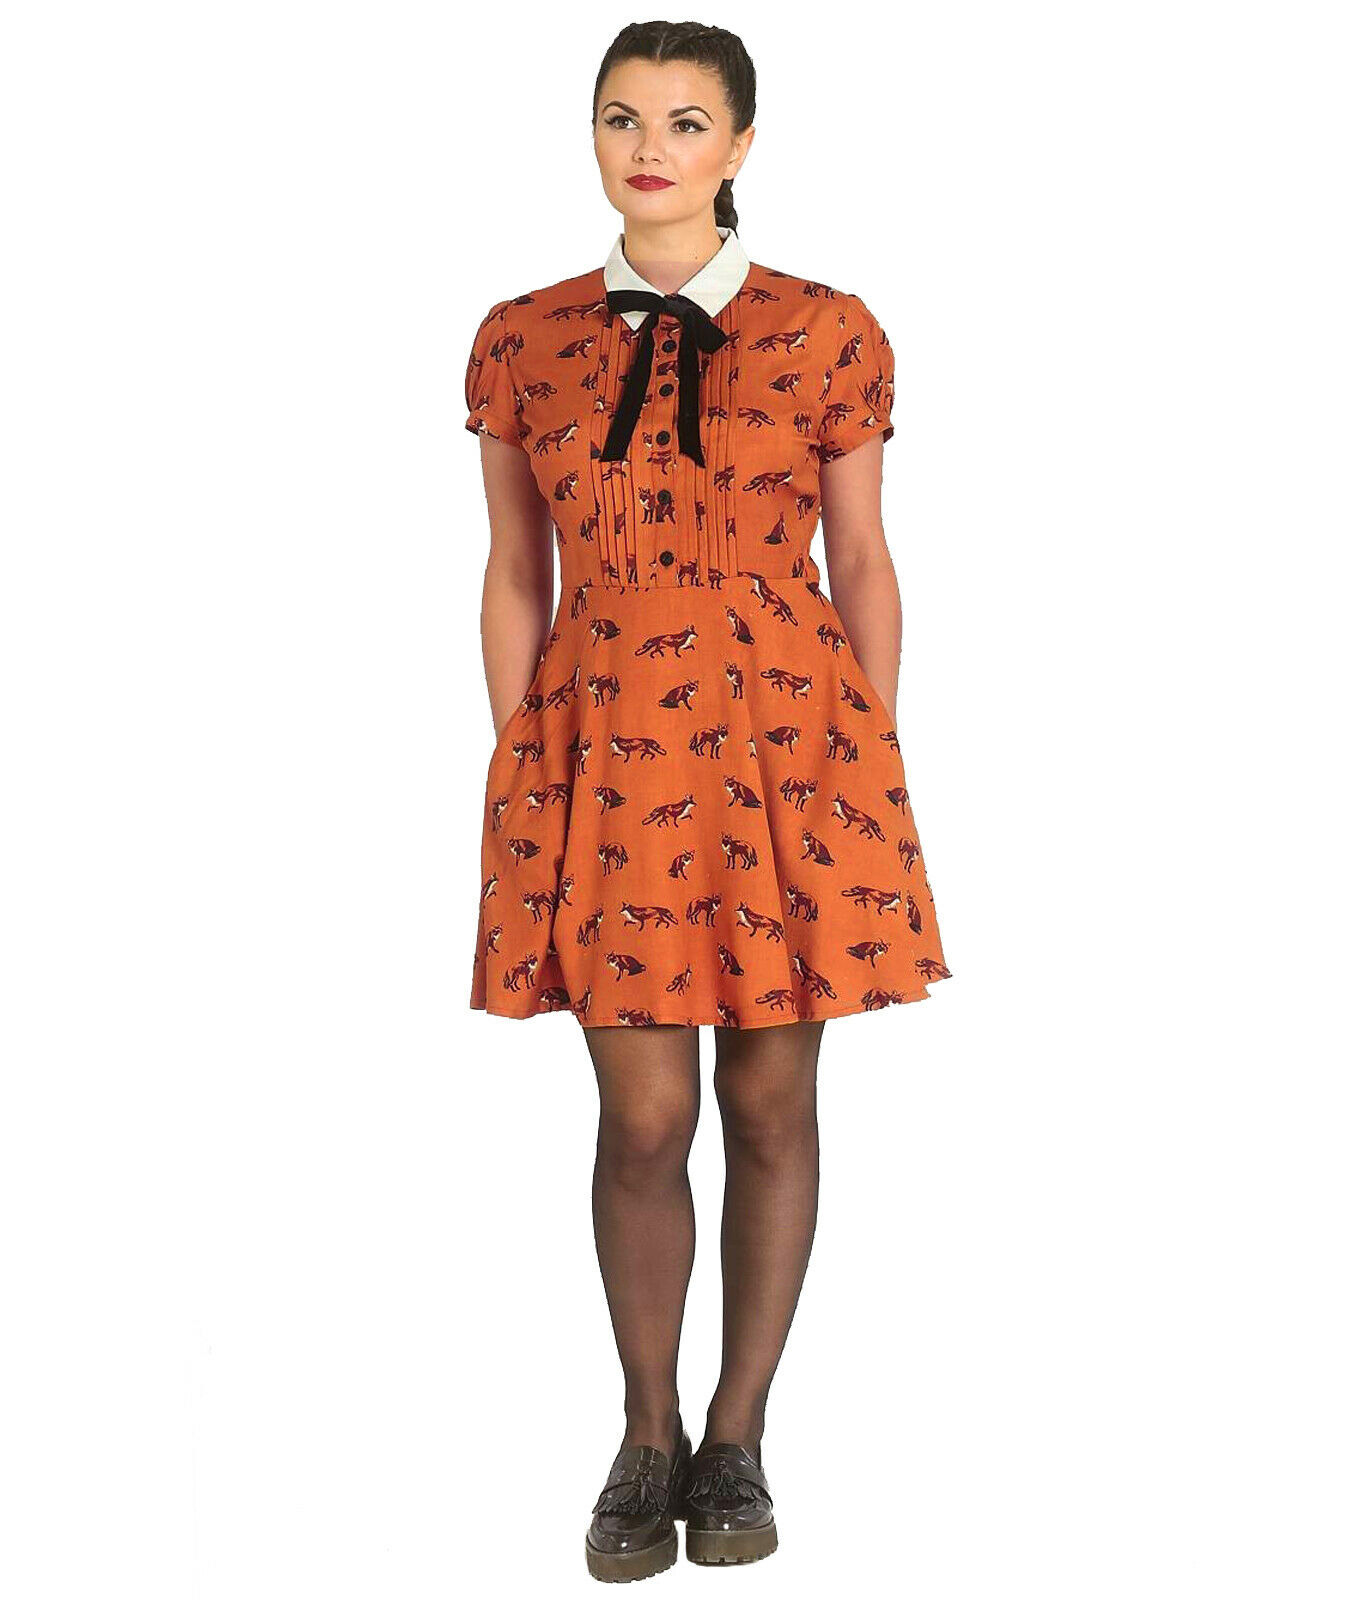 Hell-Bunny-40s-50s-Brown-Mini-Dress-Pin-Up-VIXEY-Vixen-Fox-Print-All-Sizes thumbnail 9